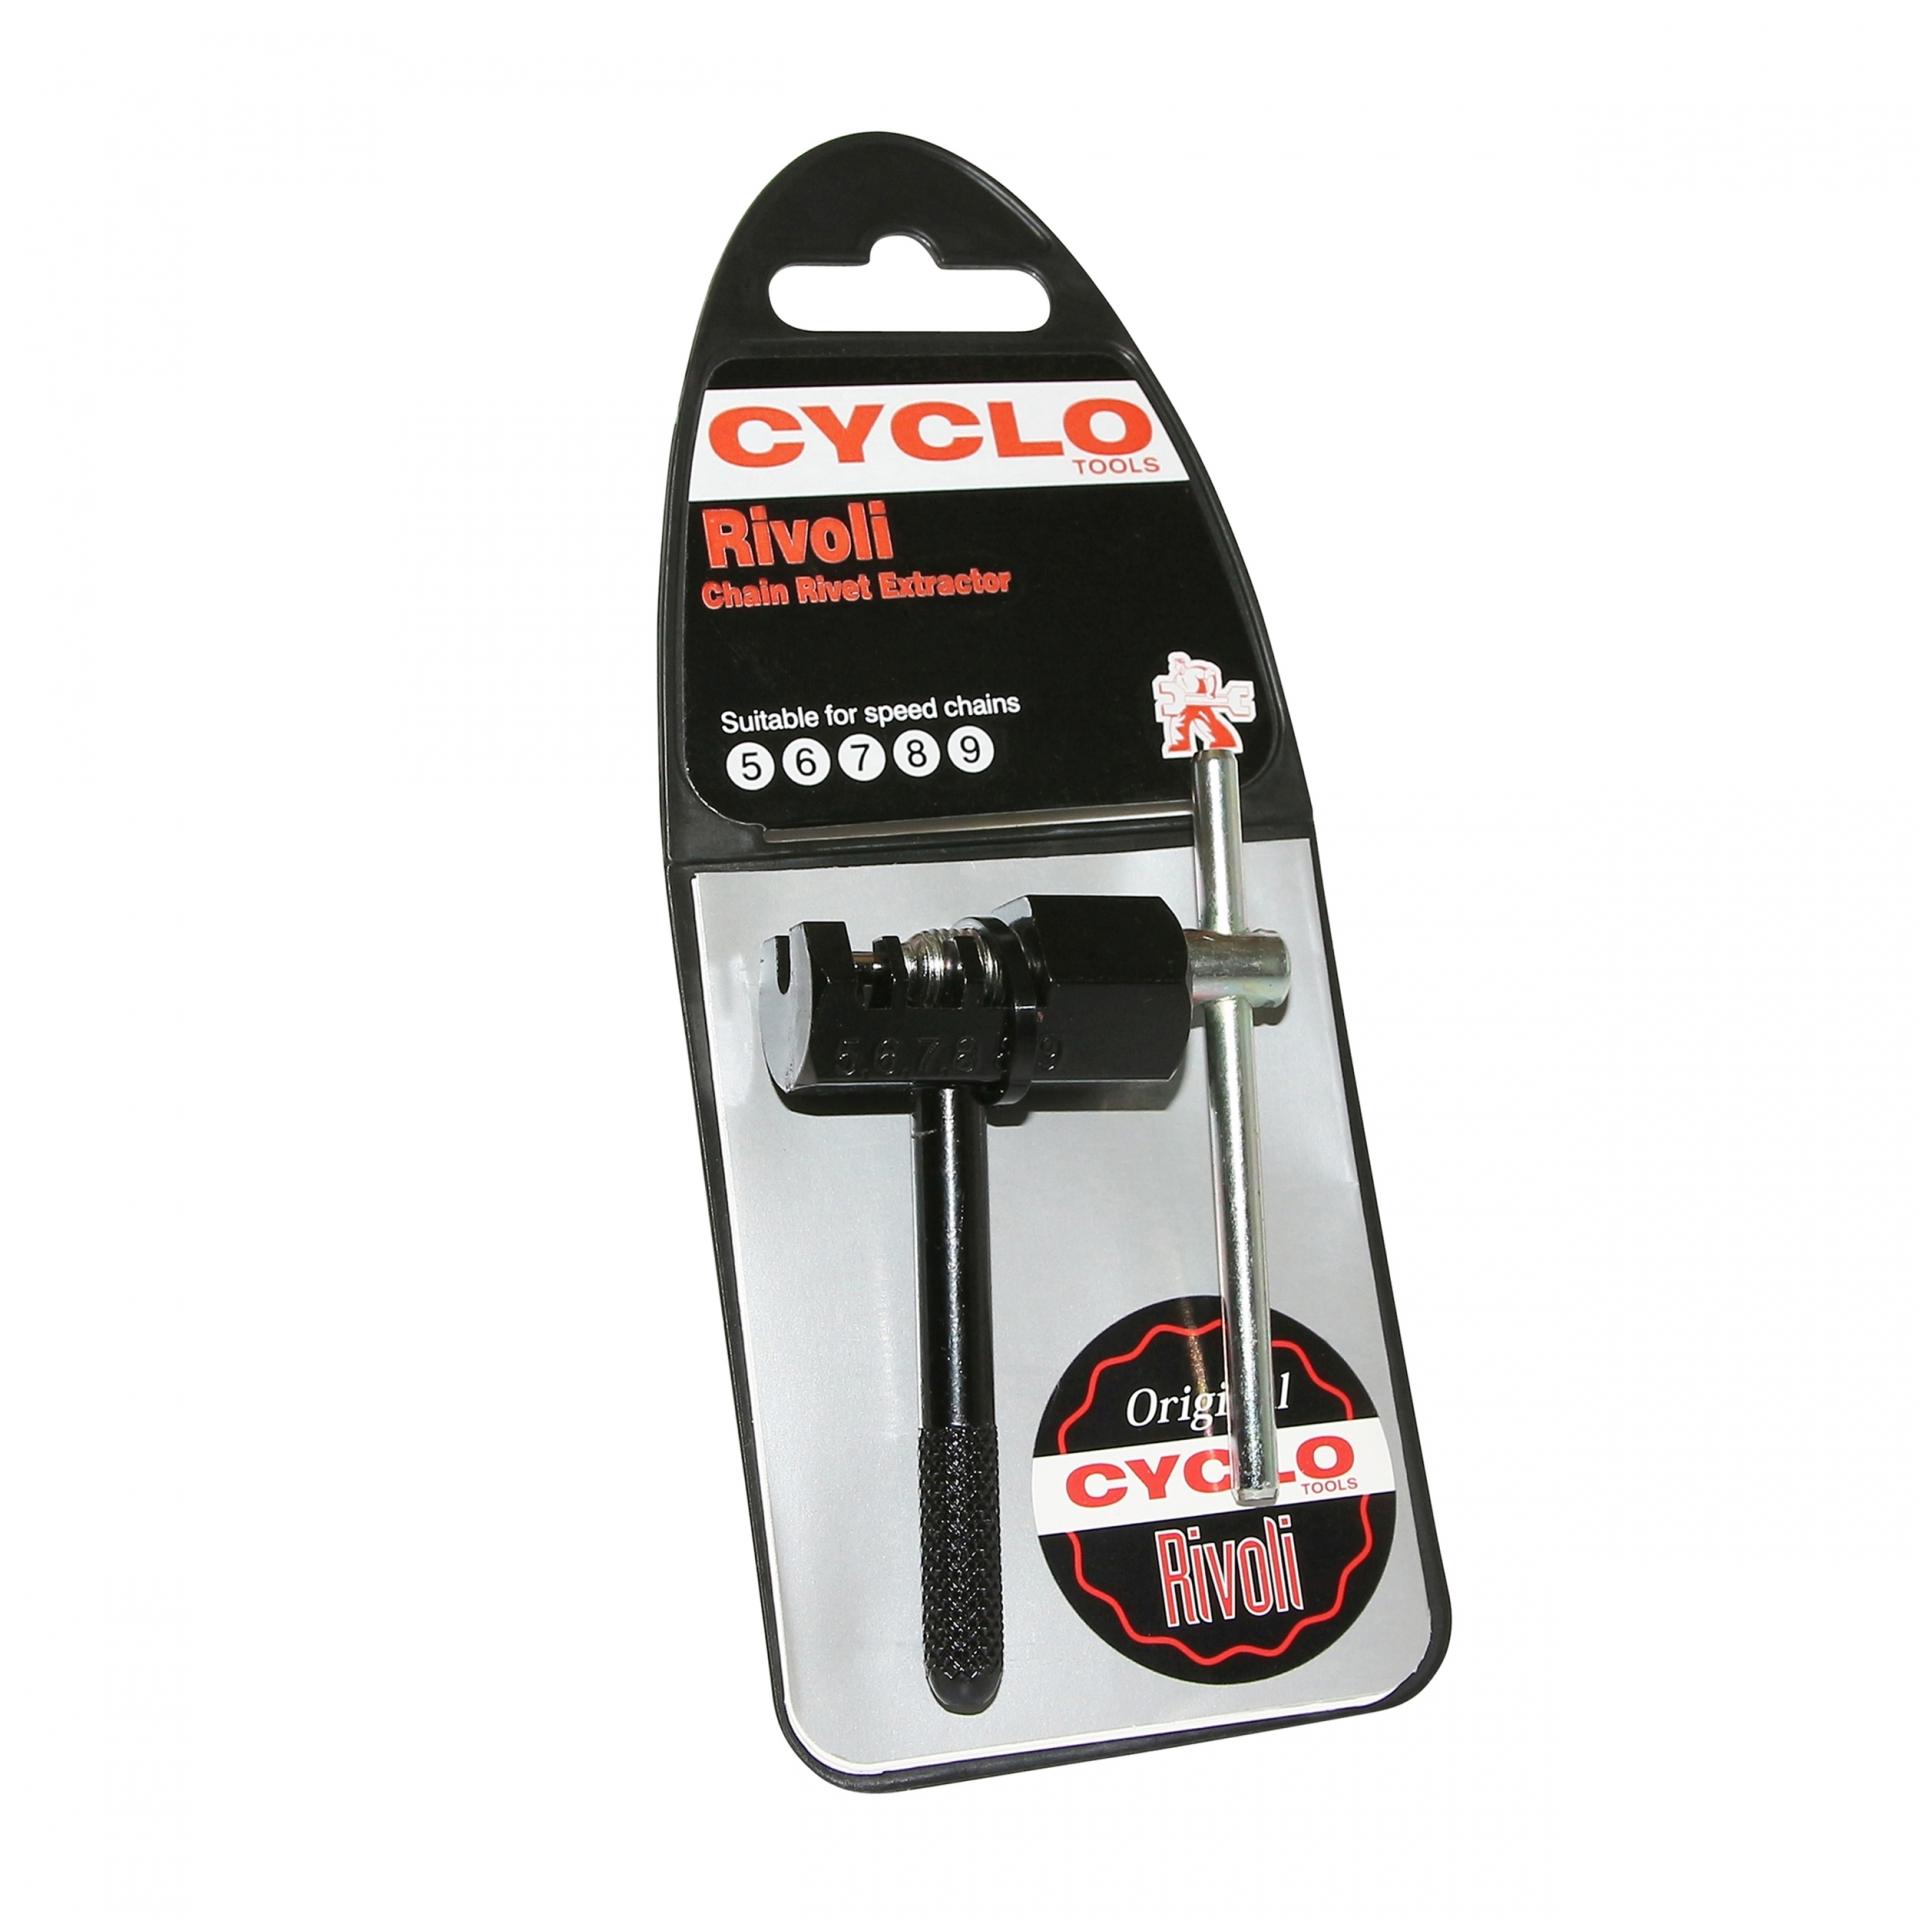 Dérive-chaine Weldtite Cyclo Rivoli 8/9 vitesses